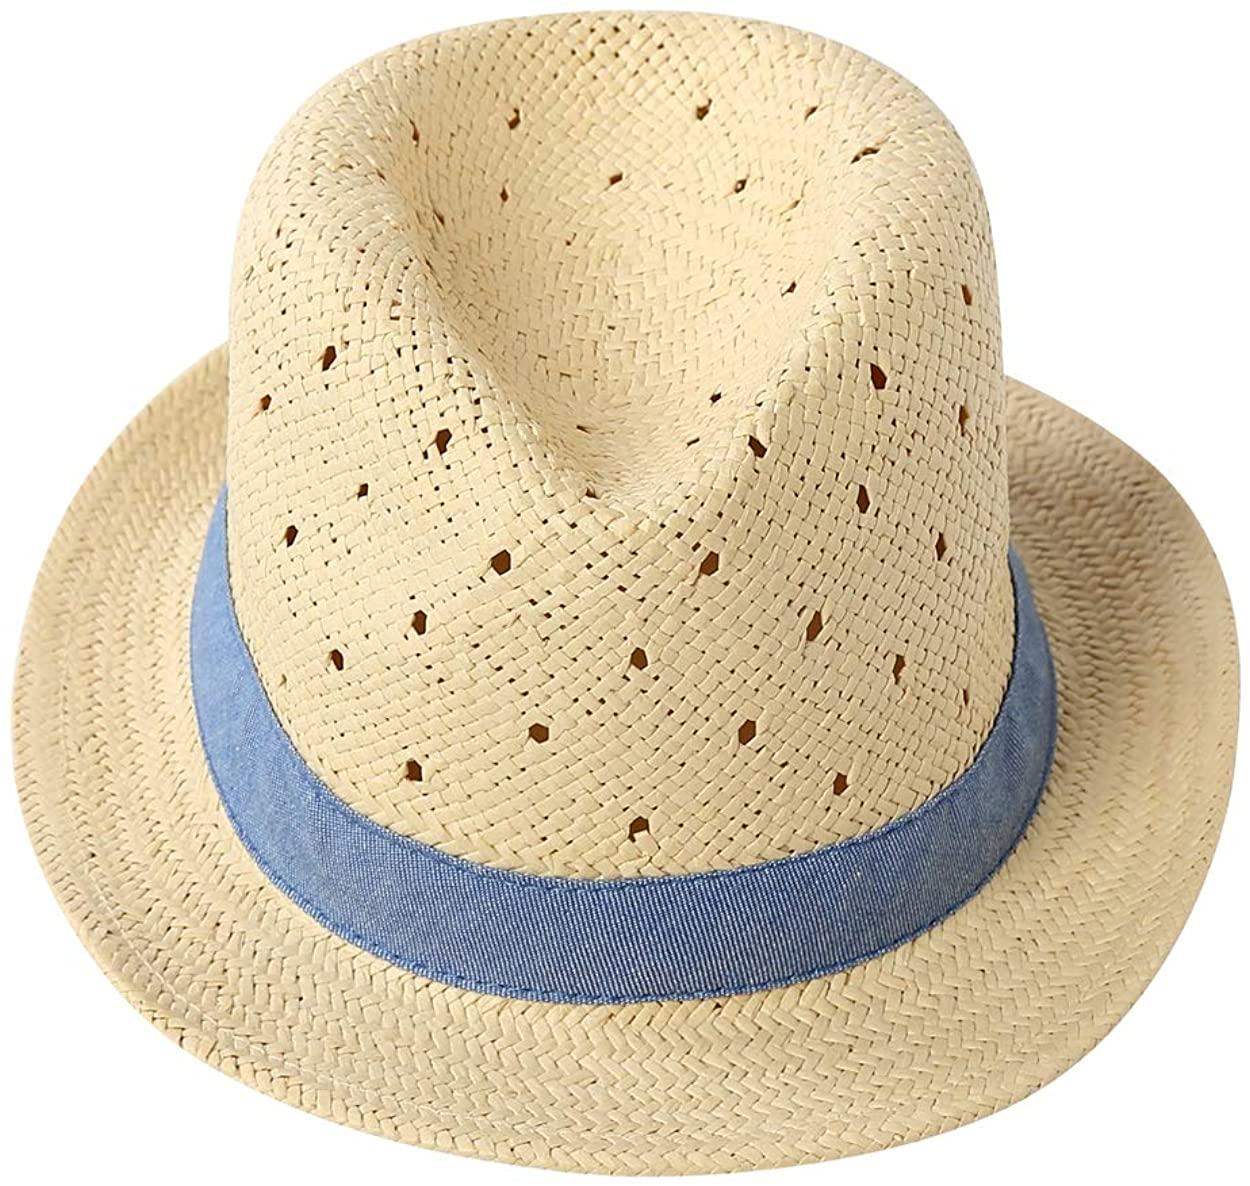 LLmoway Kids Summer Straw Hat for Baby Infant Toddler Boys Fedora Beach Sun Hat